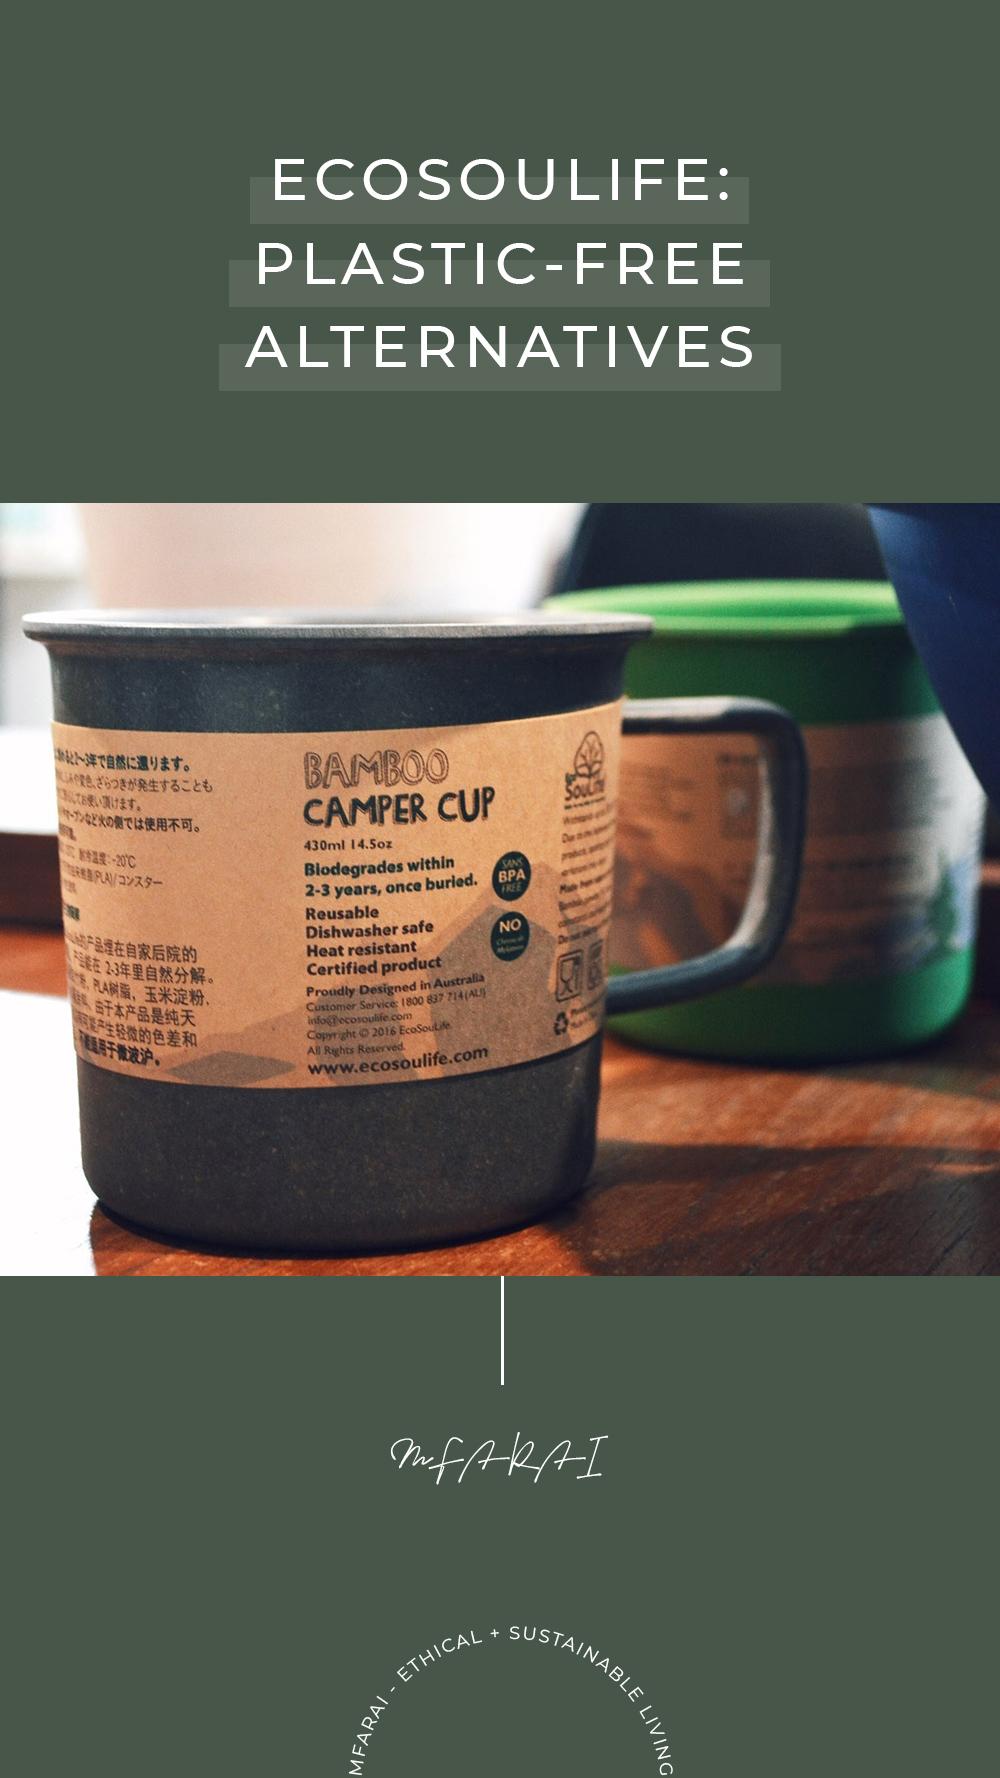 EcoSouLife Plastic-Free Biodegradable